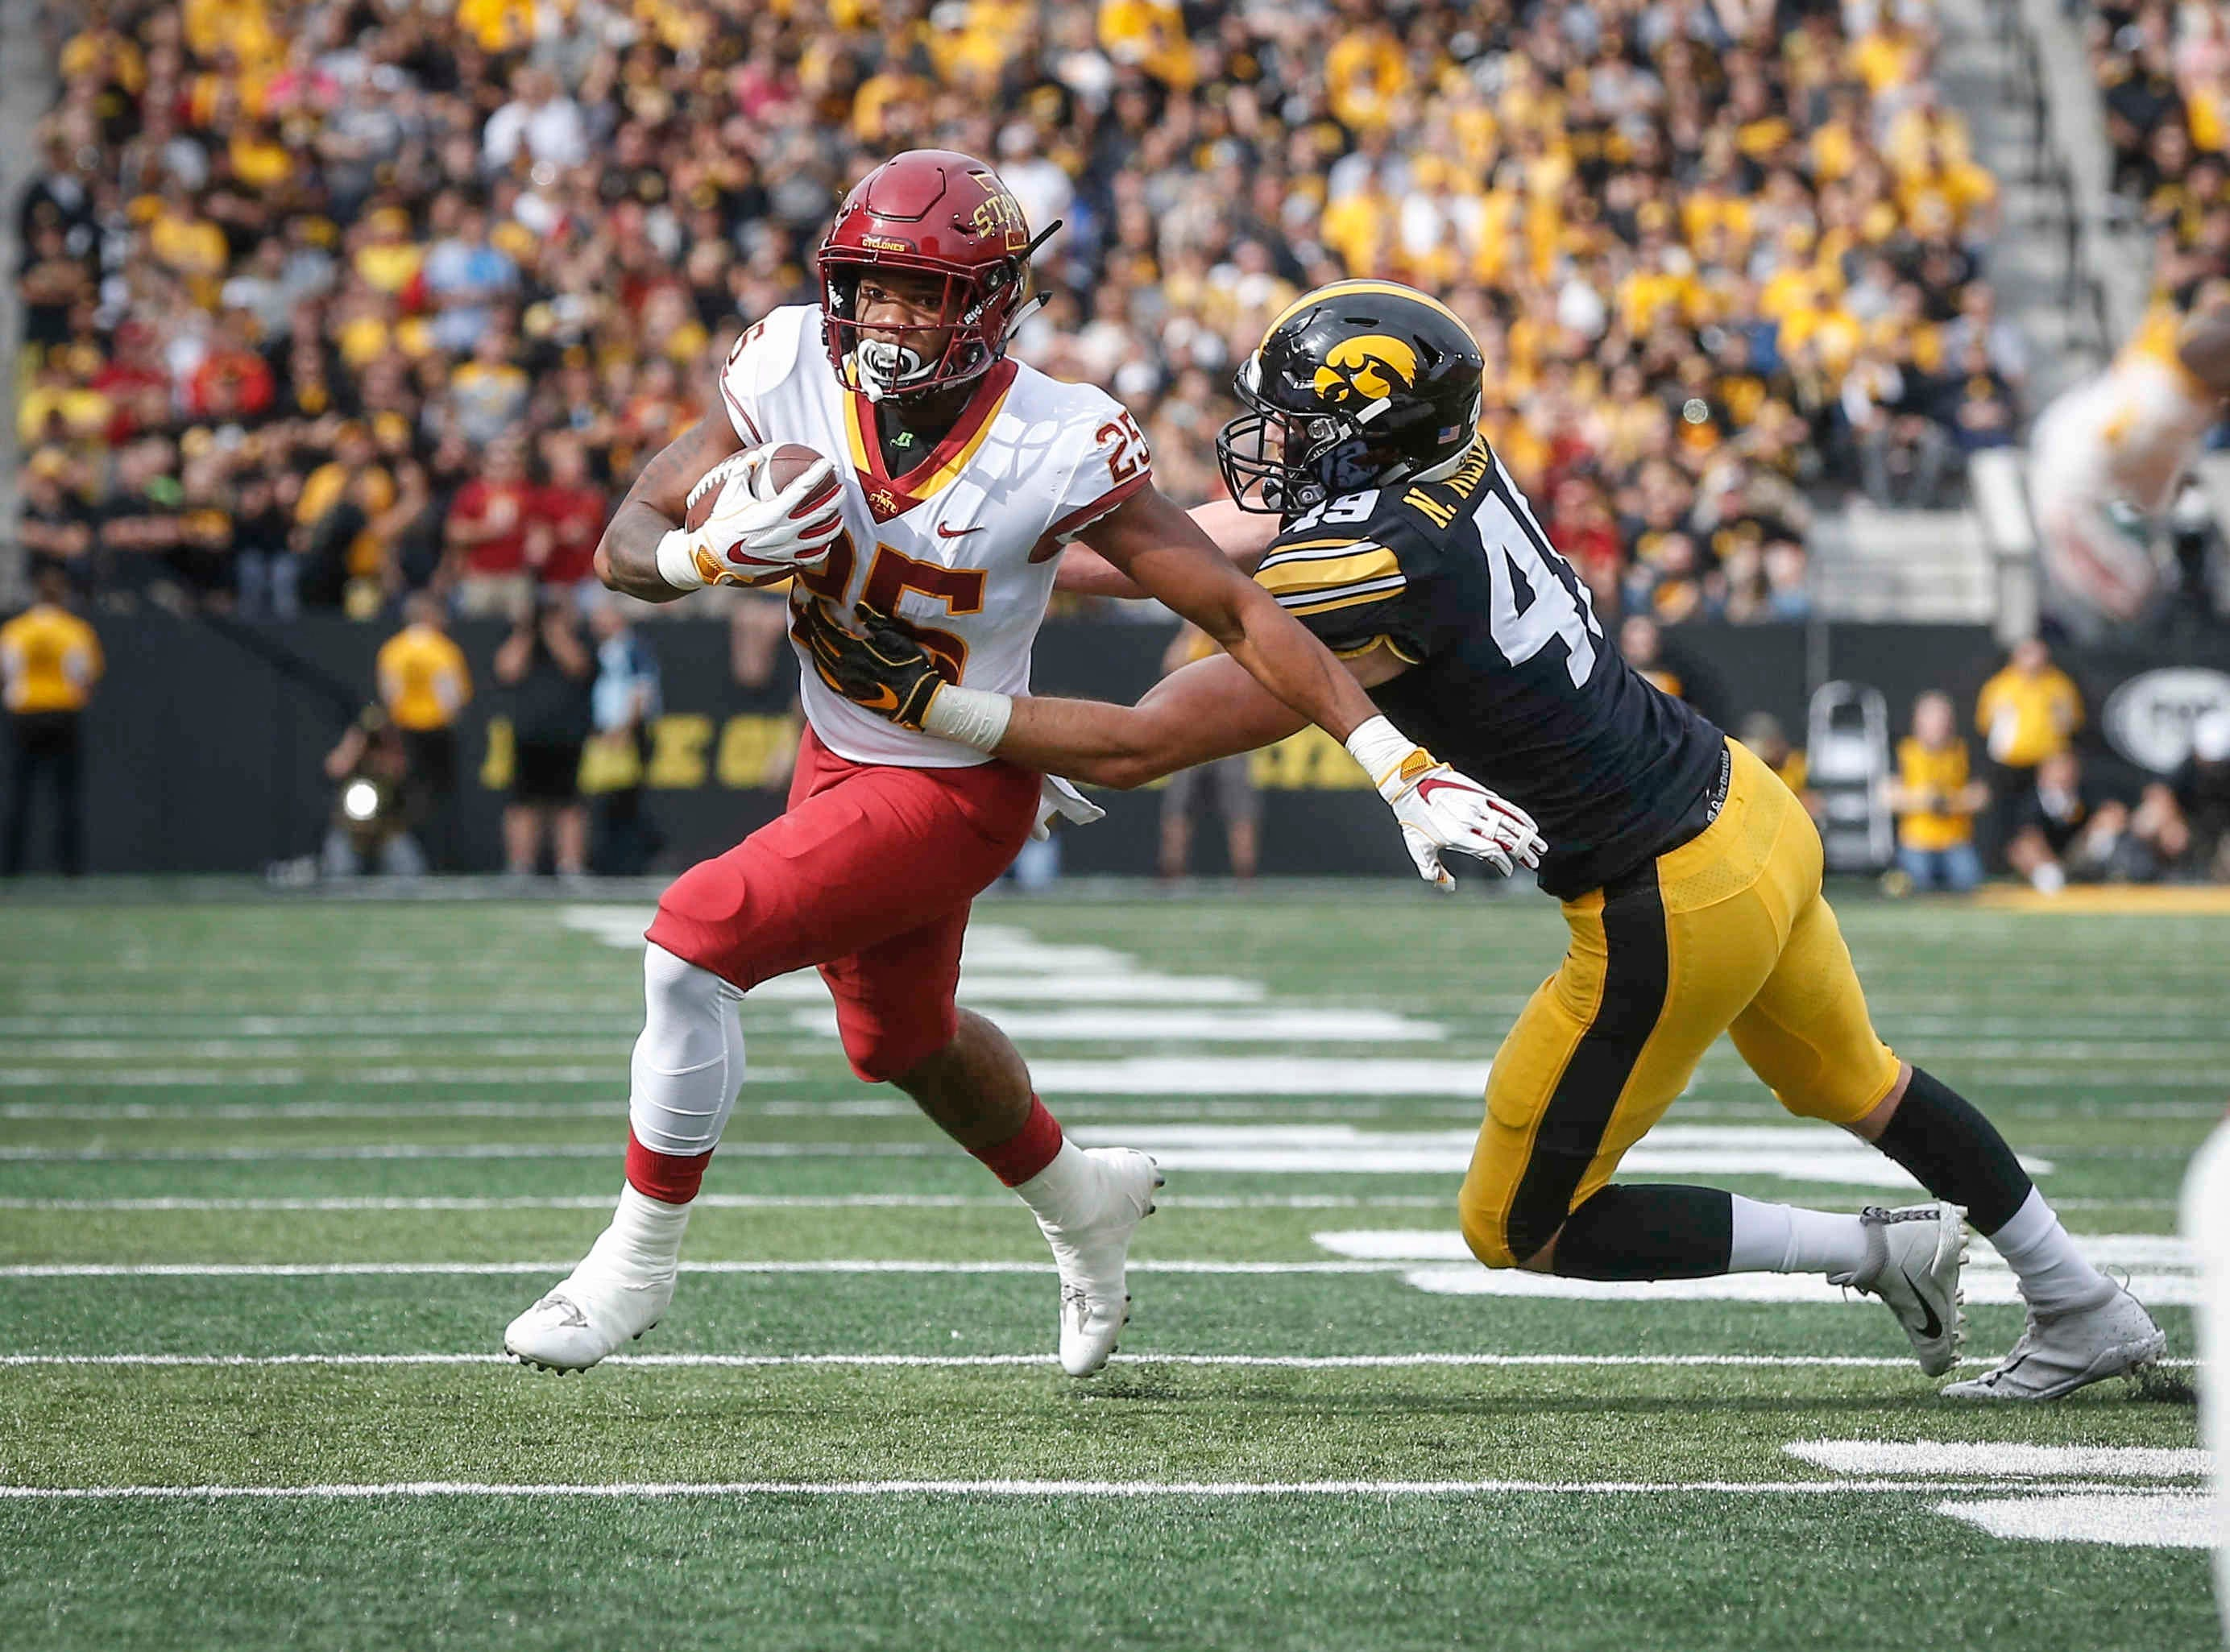 Iowa State running back Sheldon Croney escapes the reach of Iowa linebacker Nick Niemann on Saturday, Sept. 8, 2018, at Kinnick Stadium in Iowa City.